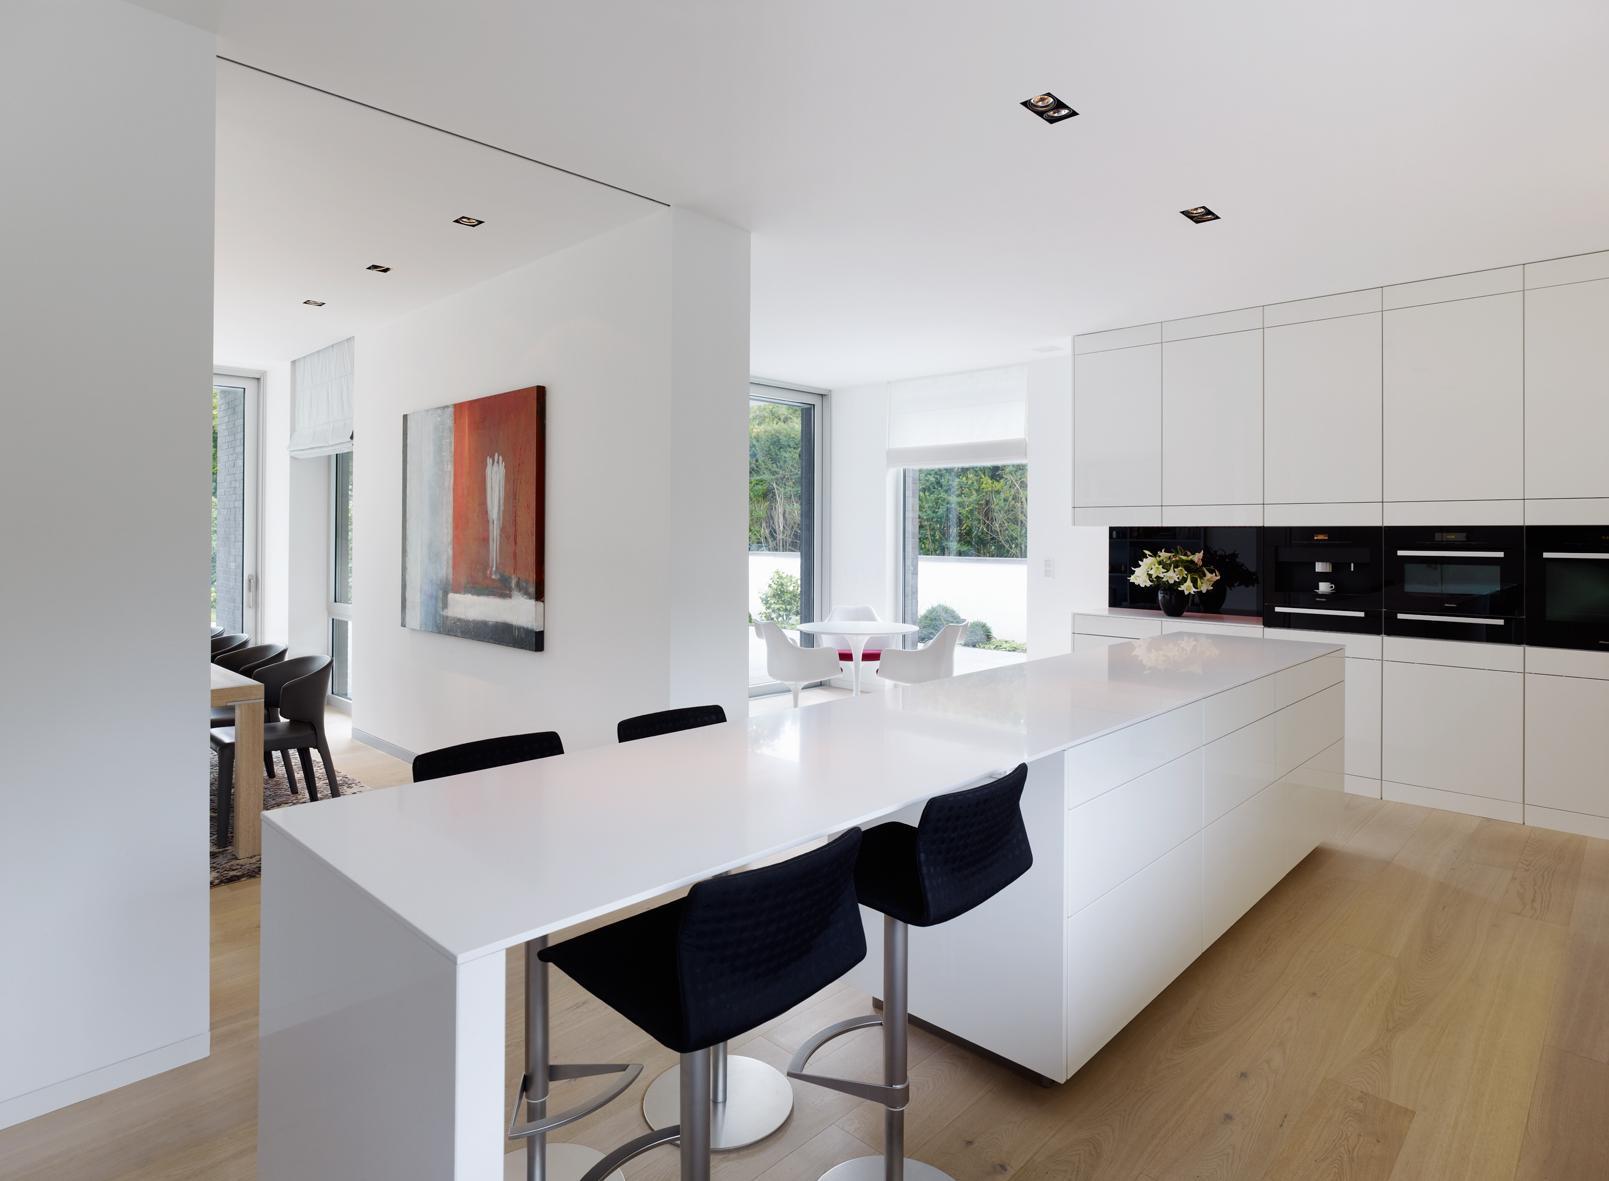 pantryk che bilder ideen couchstyle. Black Bedroom Furniture Sets. Home Design Ideas